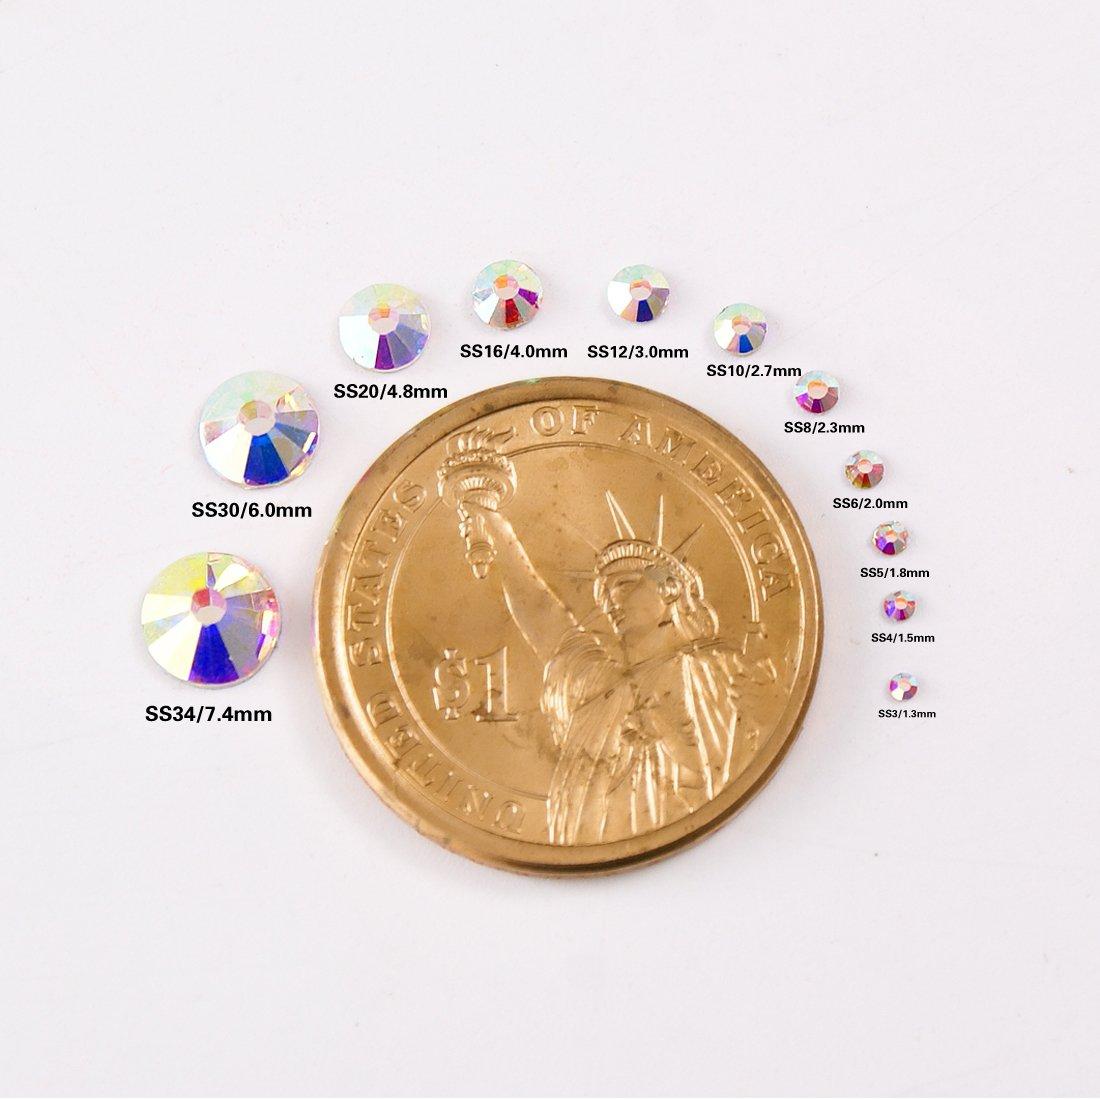 2592pcs 9 Sizes 3D Nail Art Flatback Crystals Rhinestones Round ... 6fd58b823d46